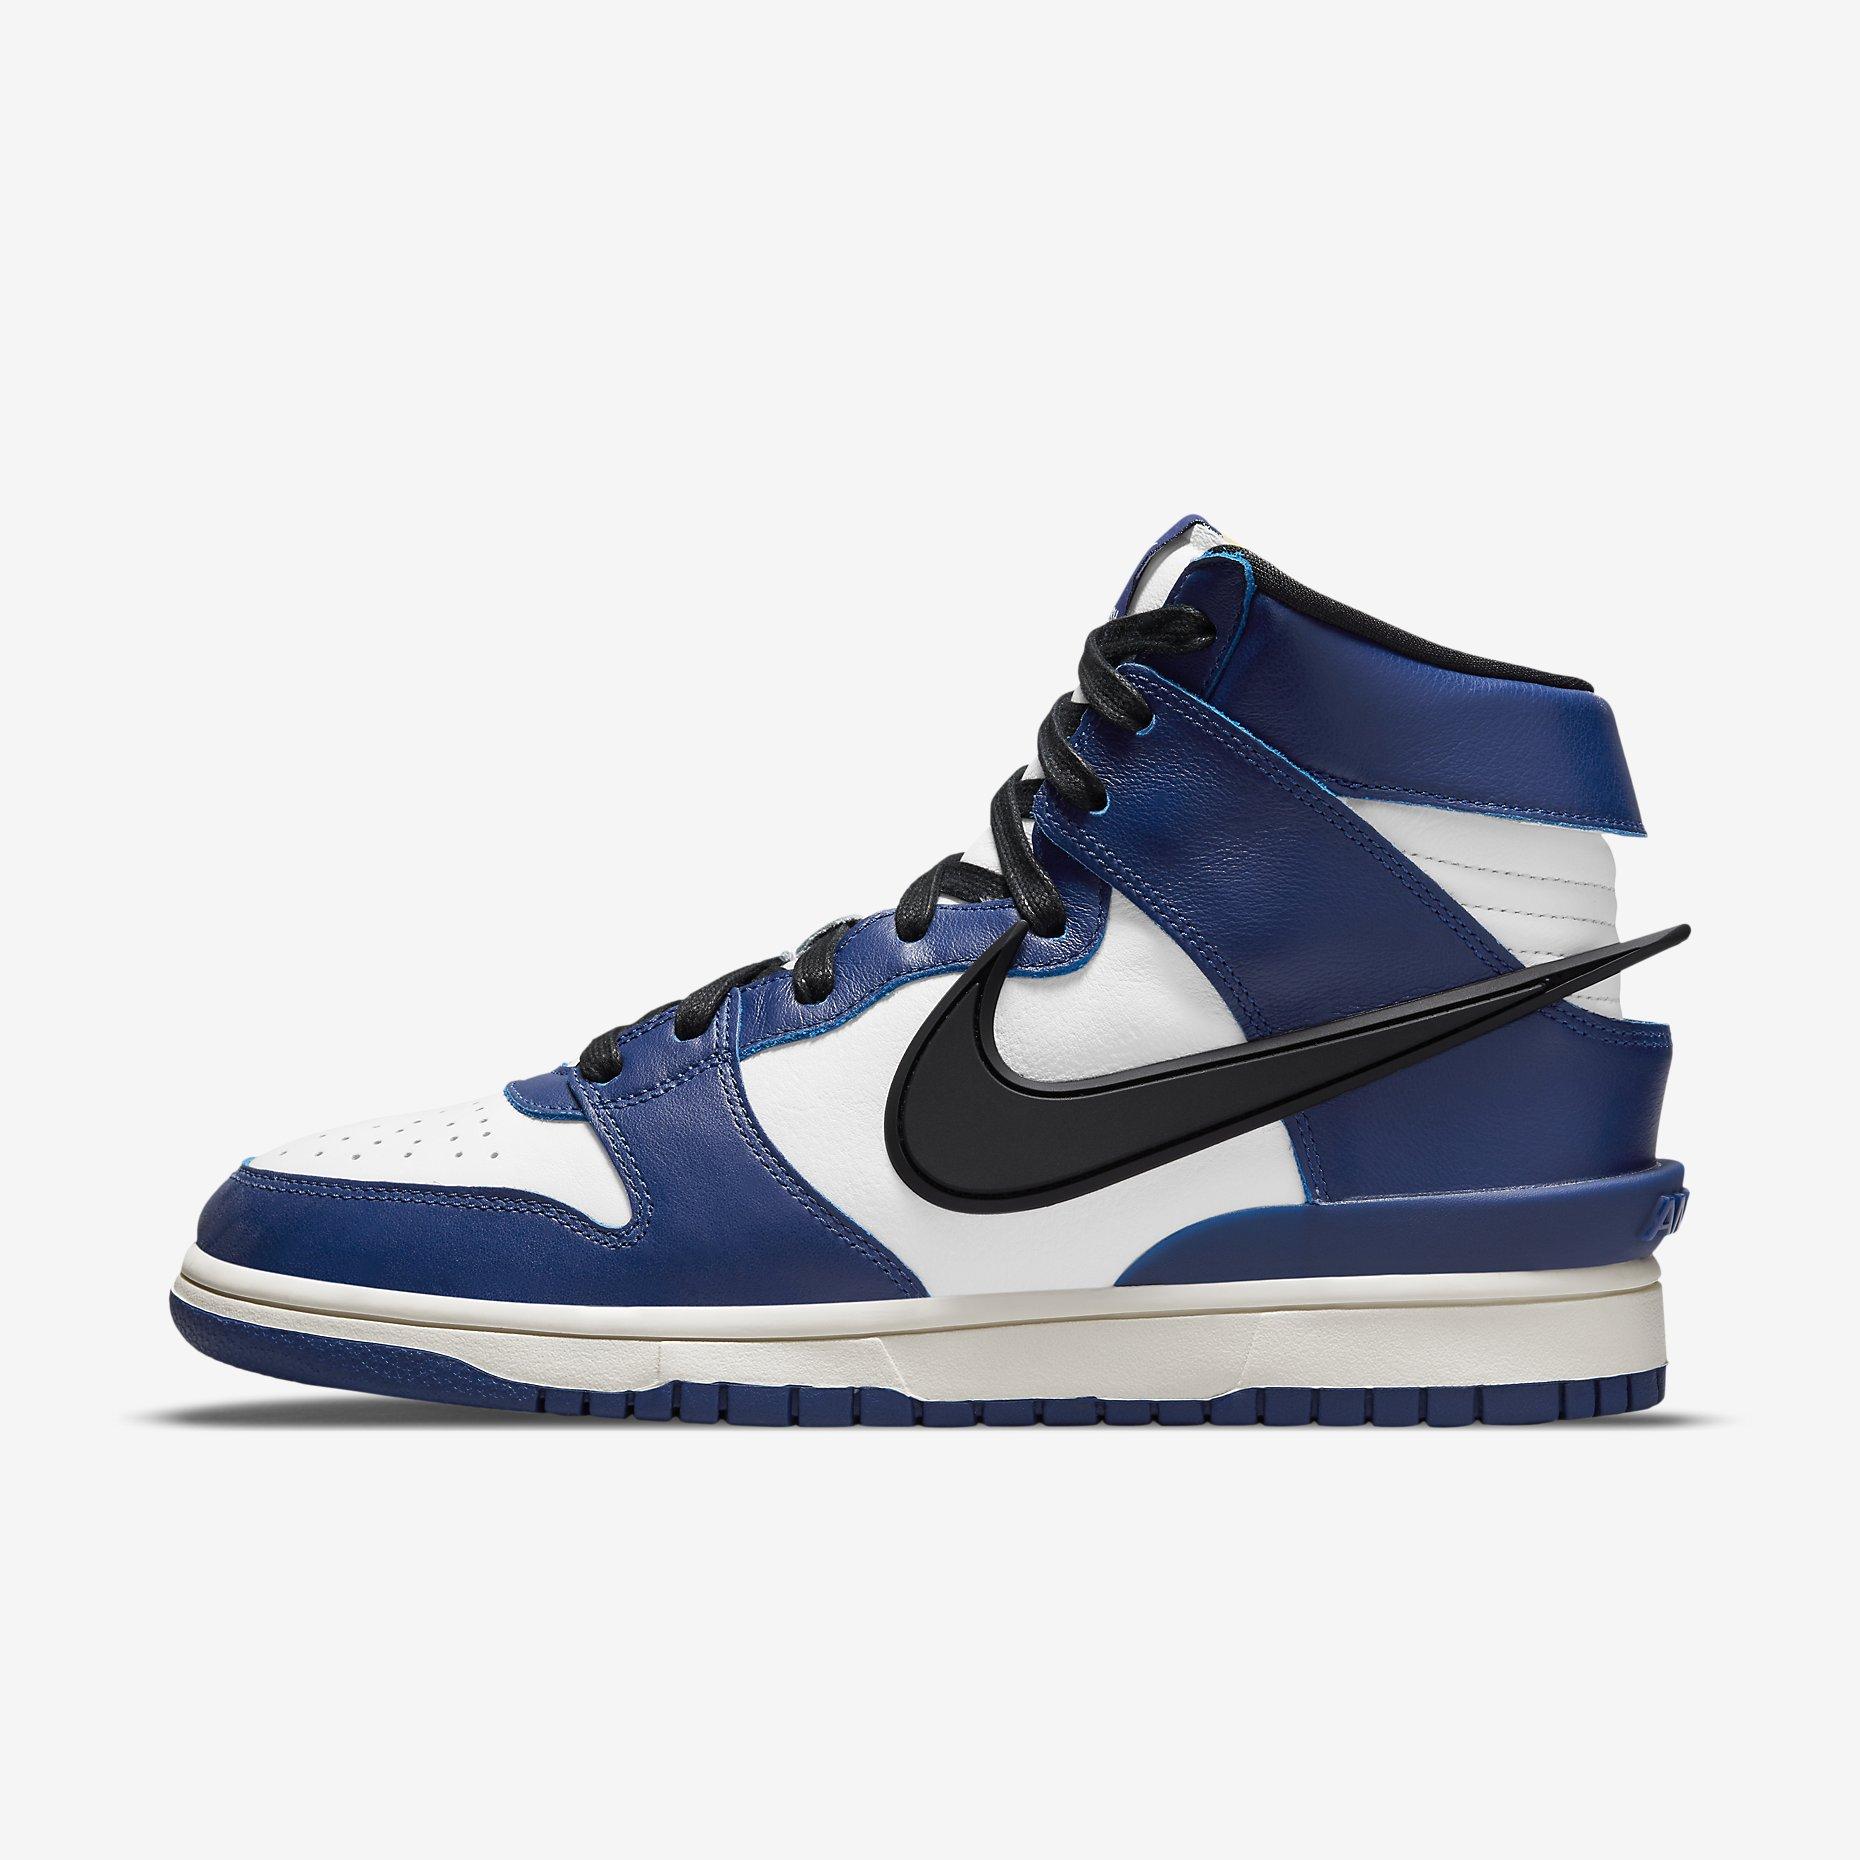 Ambush x Nike Dunk High 'Deep Royal Blue'}